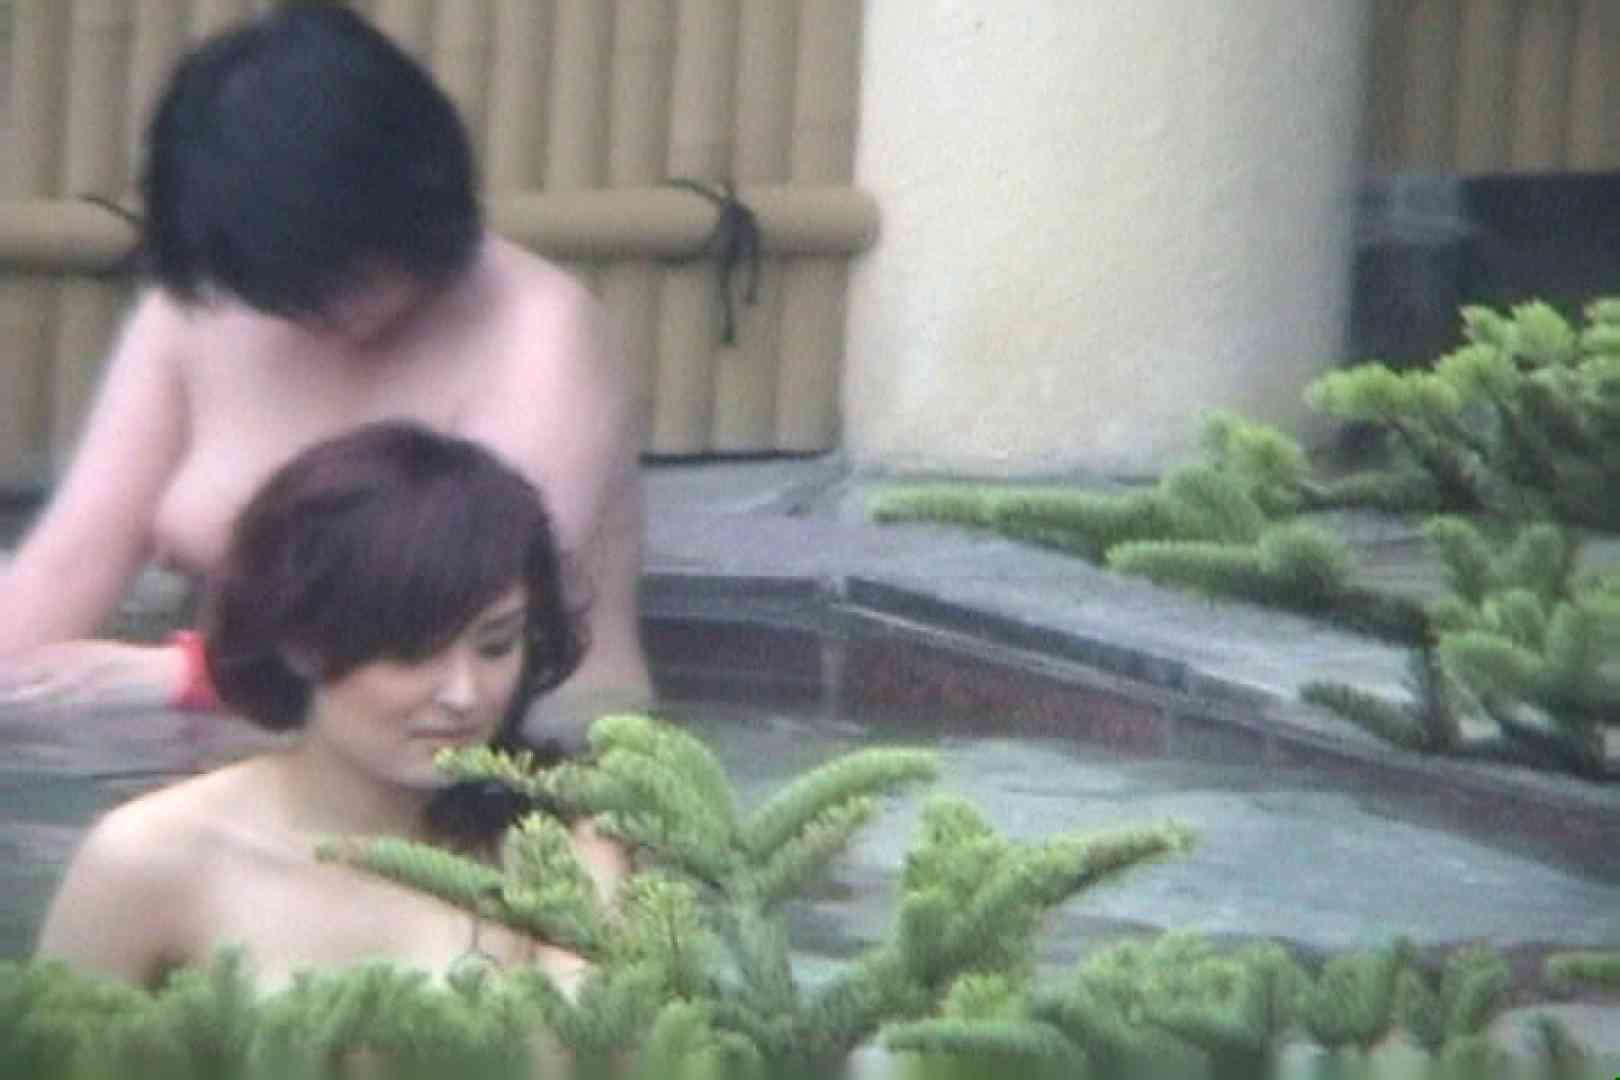 Aquaな露天風呂Vol.81【VIP限定】 女体盗撮  80連発 3